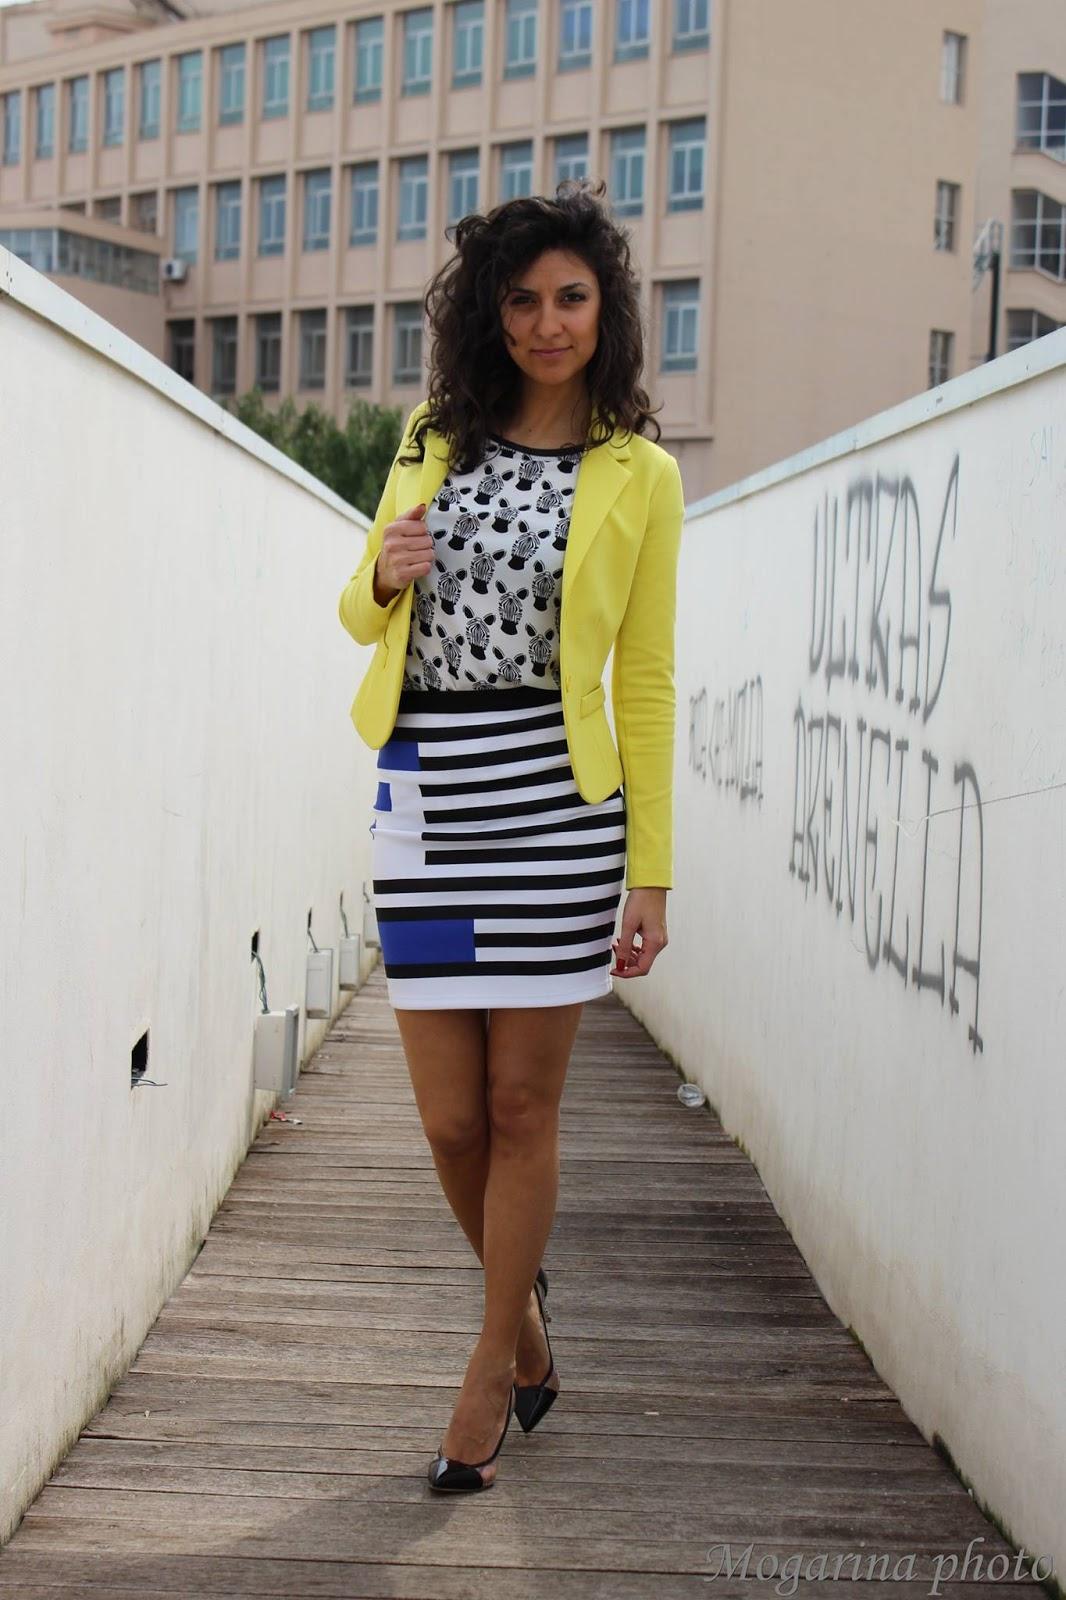 dress, luan, skirt, b&w, black, whyte, striped, righe, fantasia, minigonna, giallo, slim, giacca, pvc, vinile, shoes